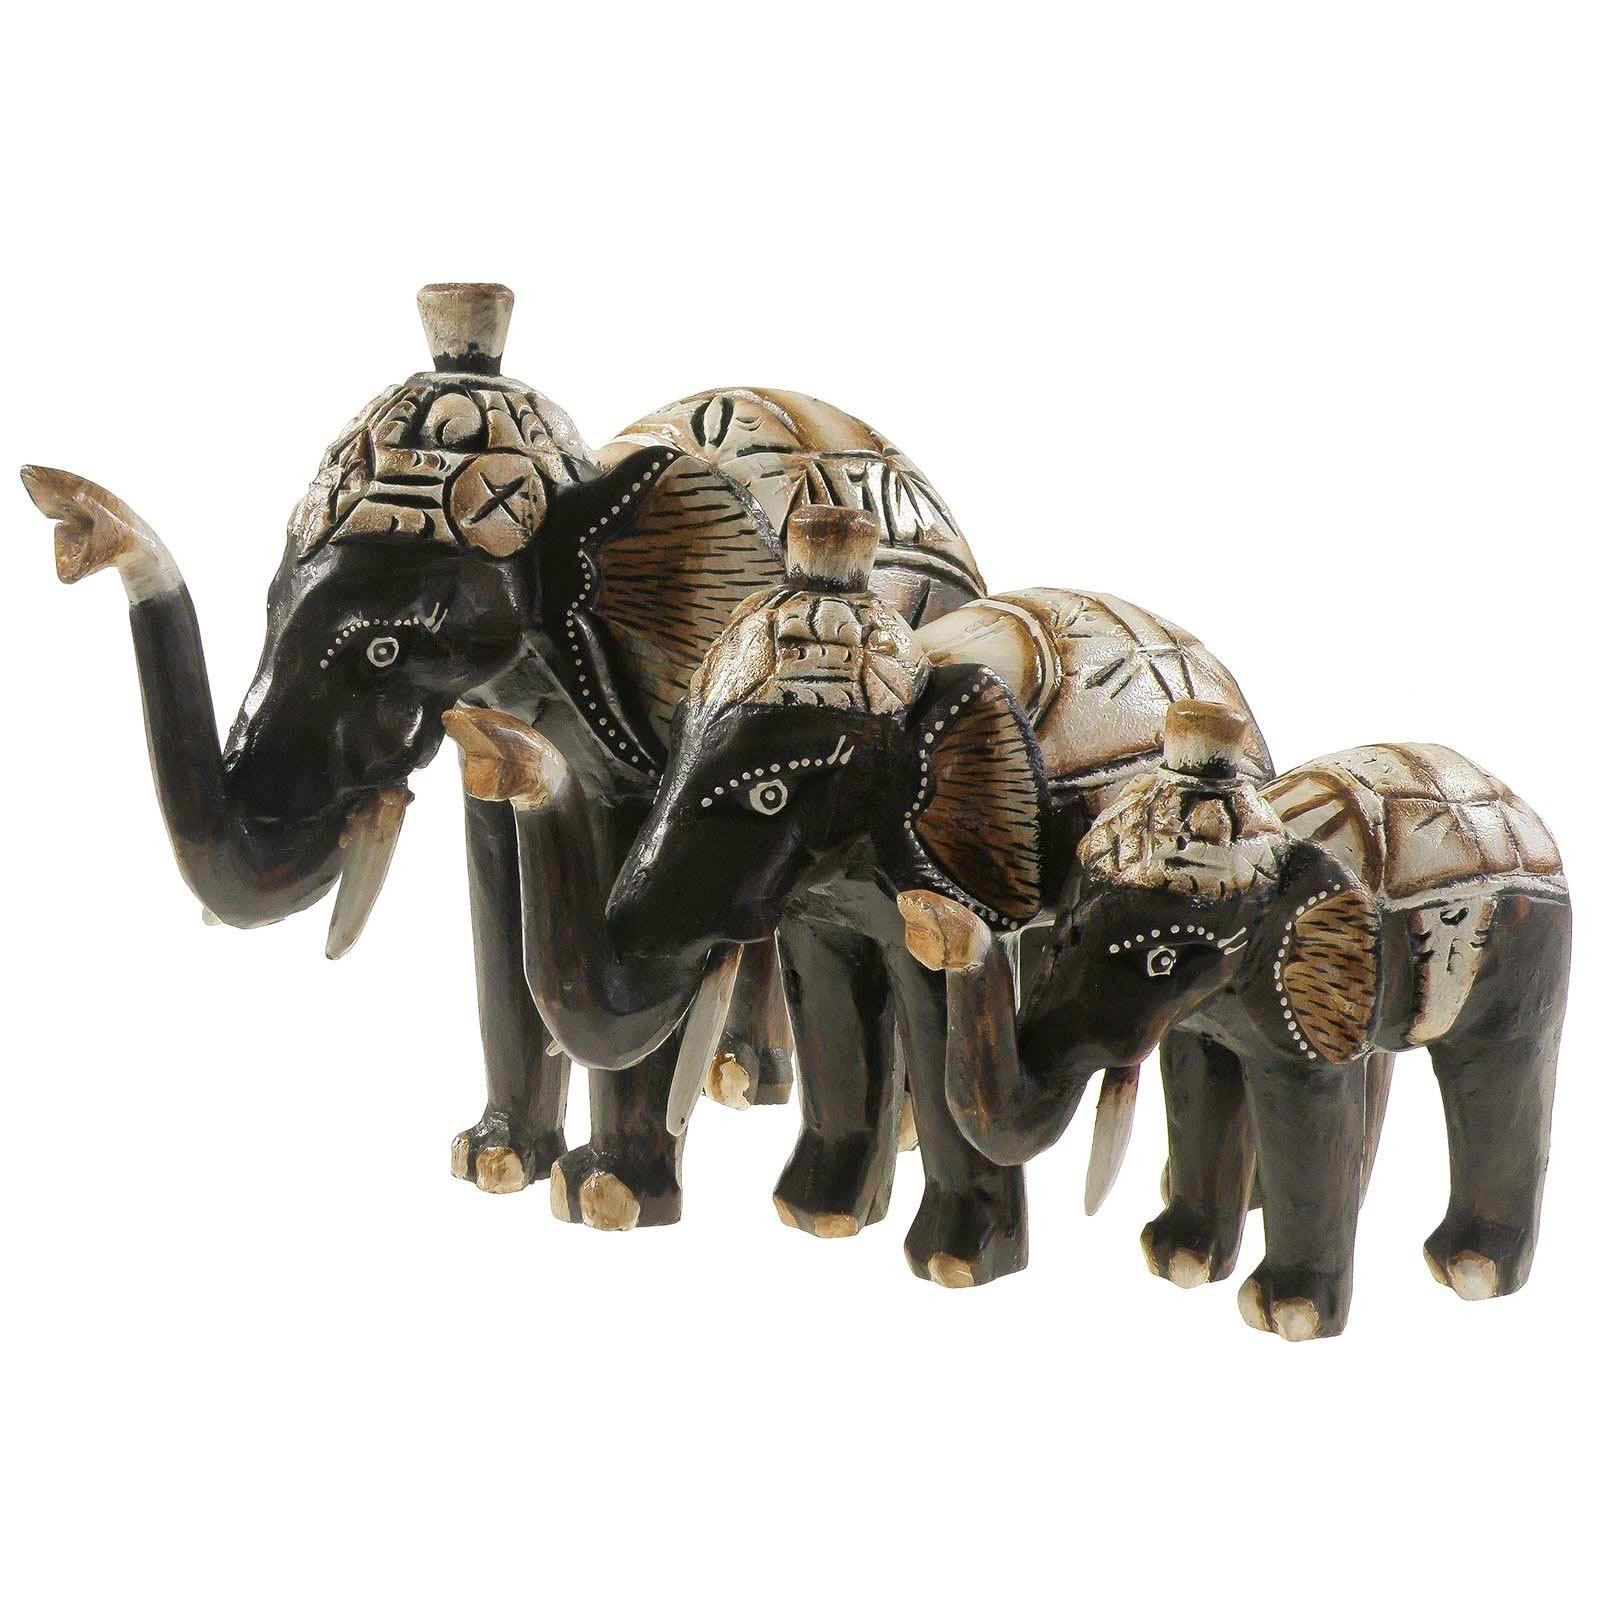 1 elefant sabi aus albesia holz deko elefant ca 20 cm. Black Bedroom Furniture Sets. Home Design Ideas